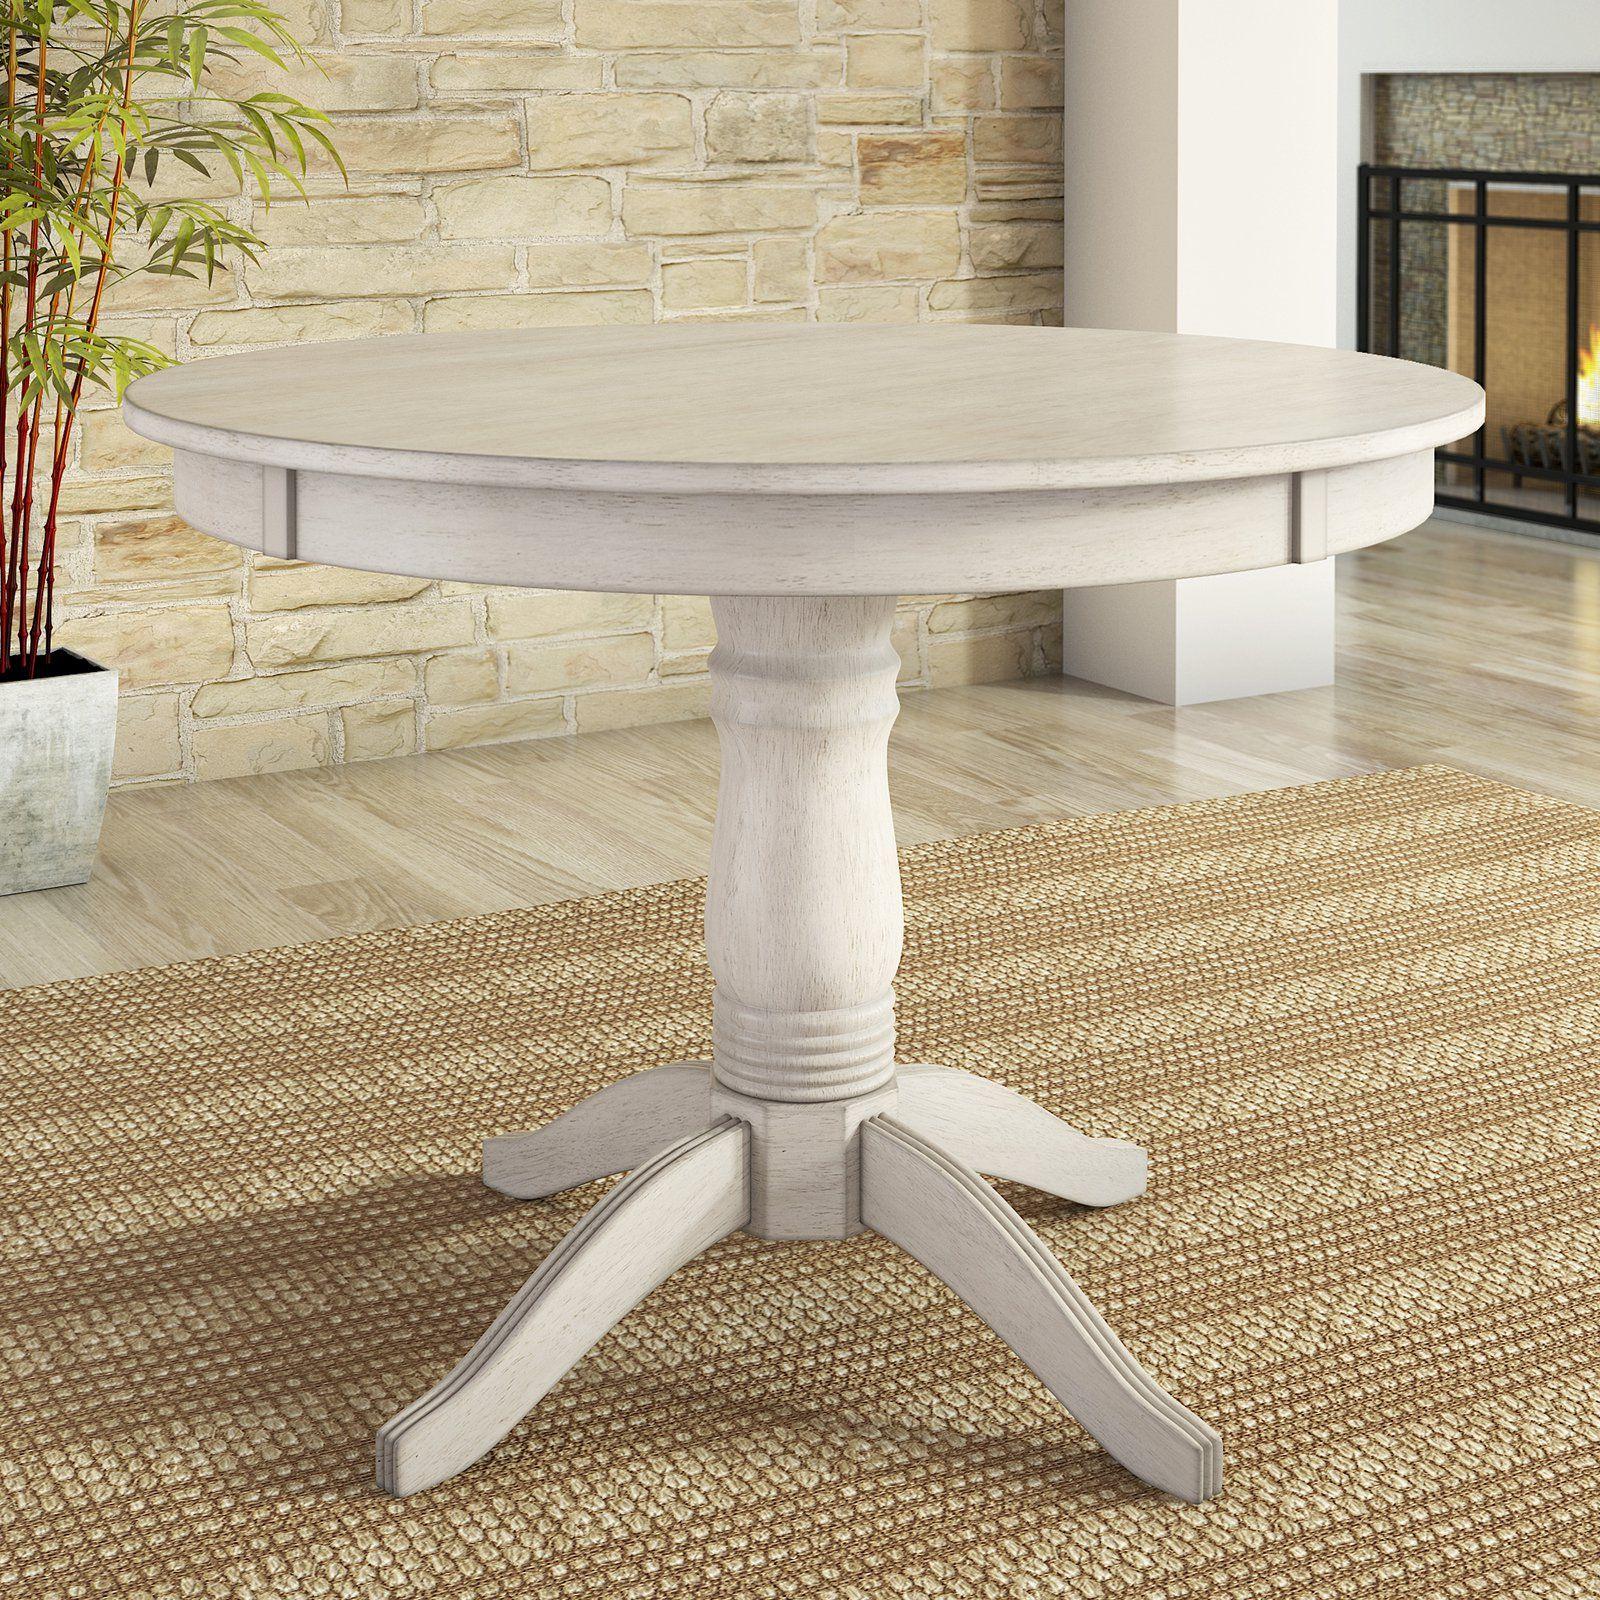 Lexington 42 Round Wood Pedestal Base Dining Table White Walmart Com Round Dining Table Dining Table Round Dining